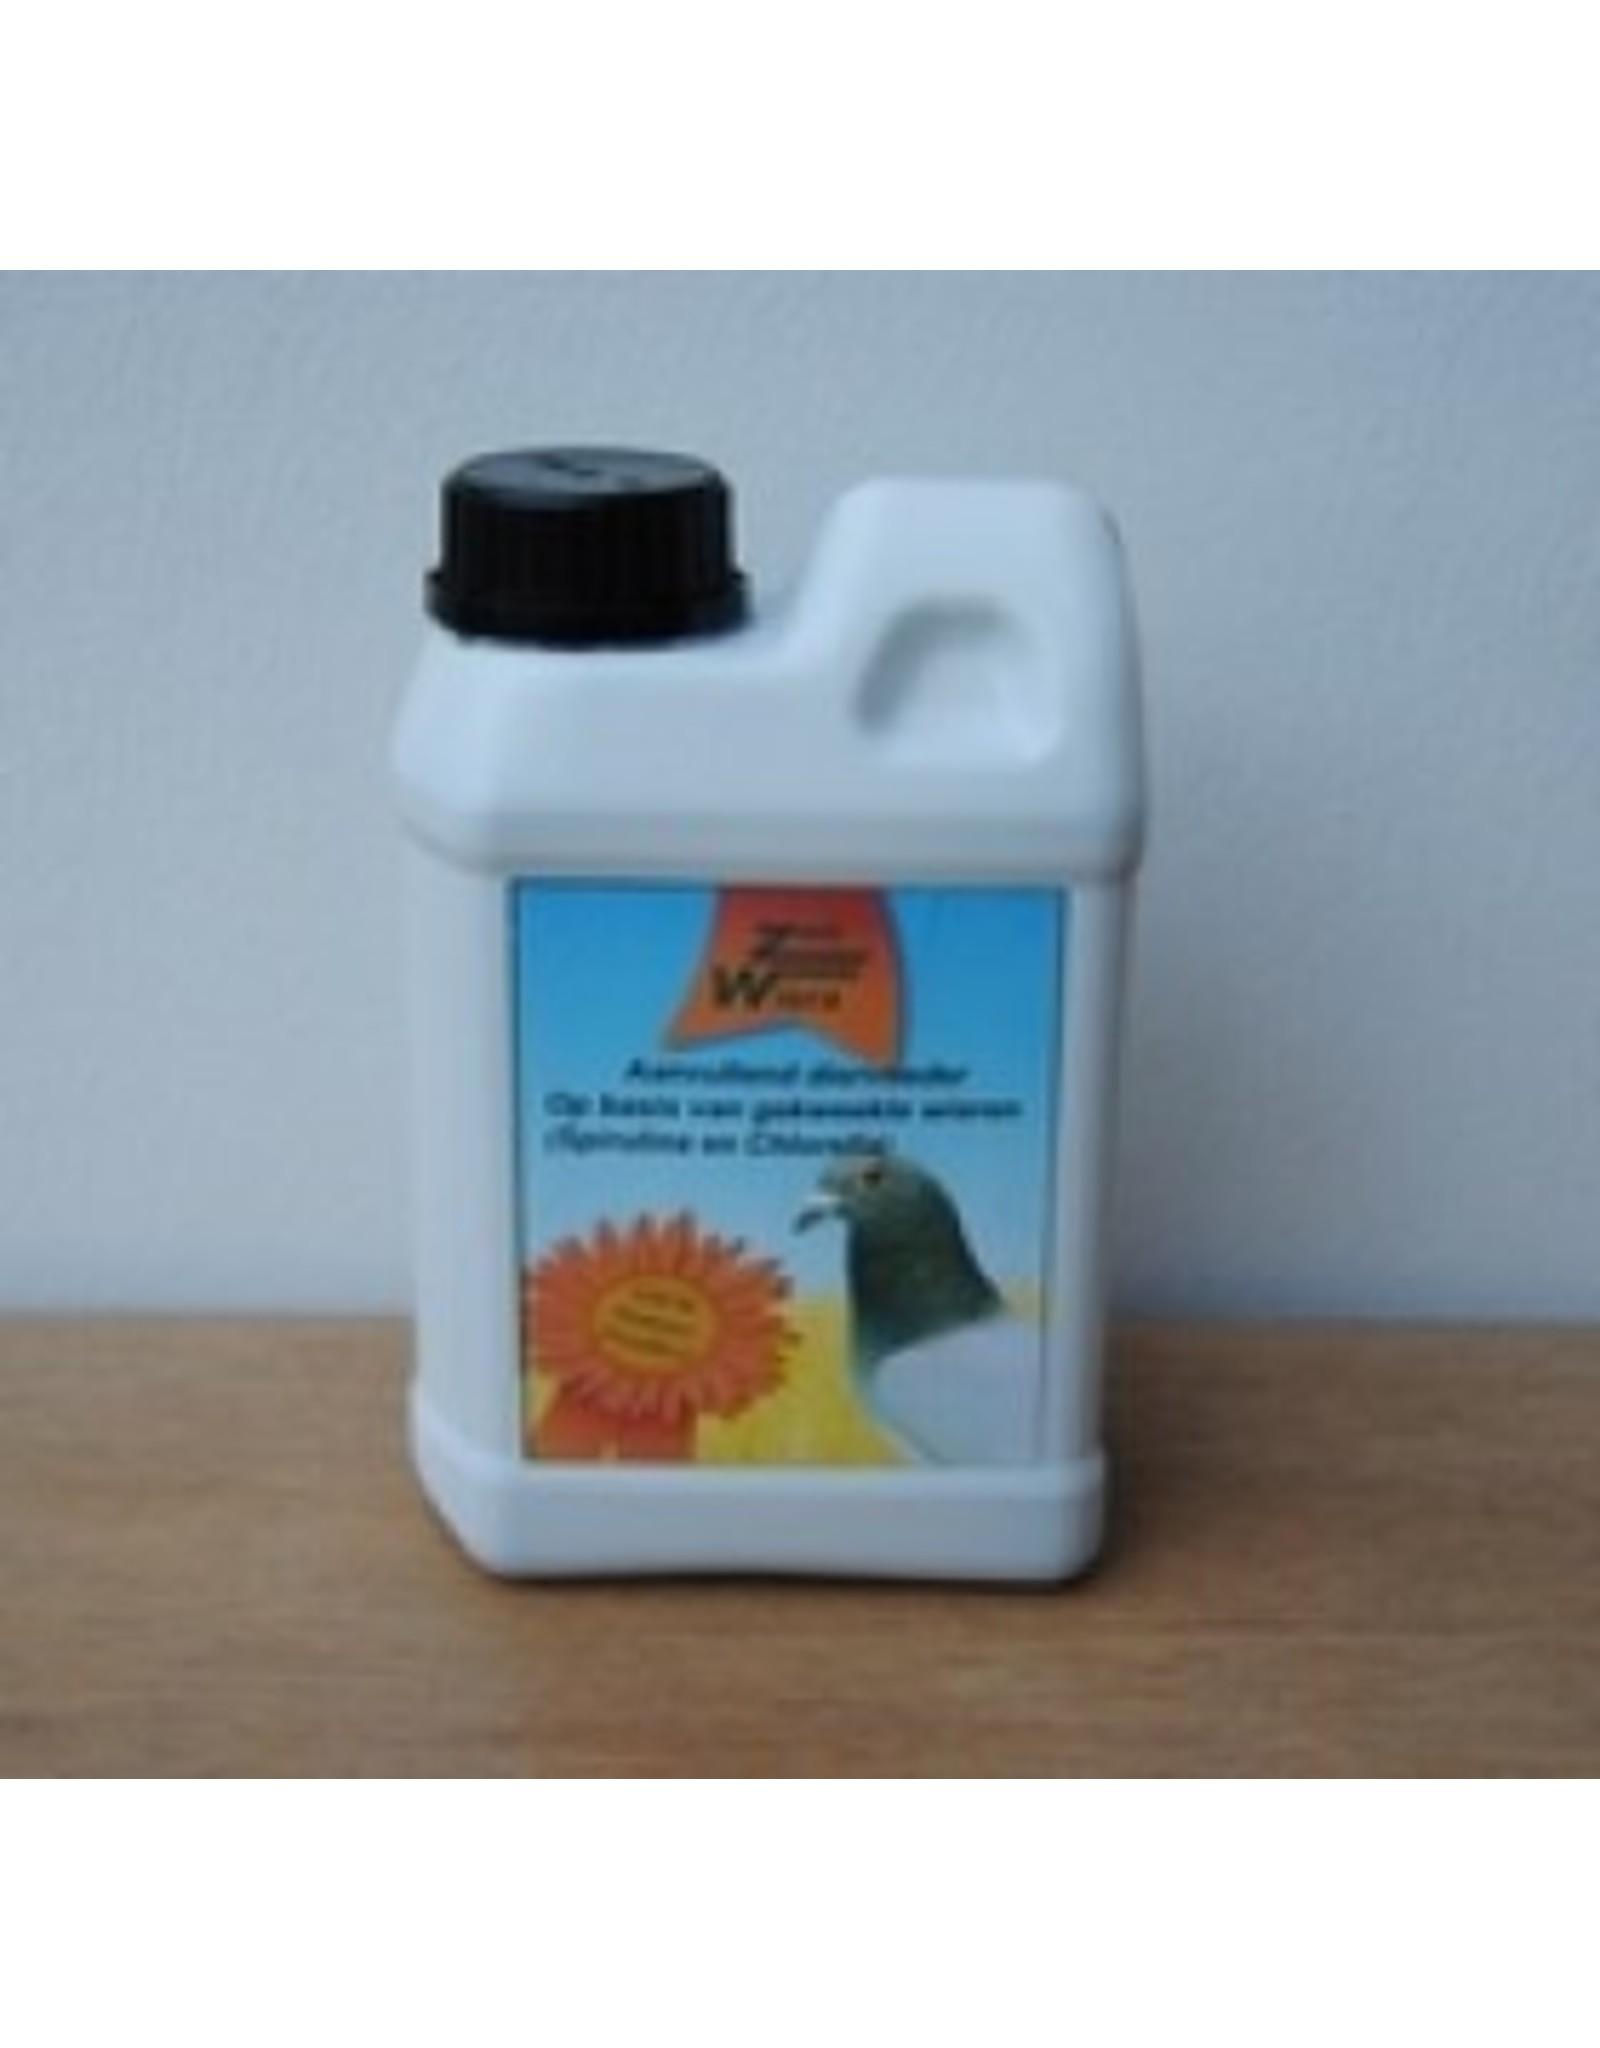 Zoowiera Chlorella-spirulina vloeibaar  Zoowiera duif 1 l